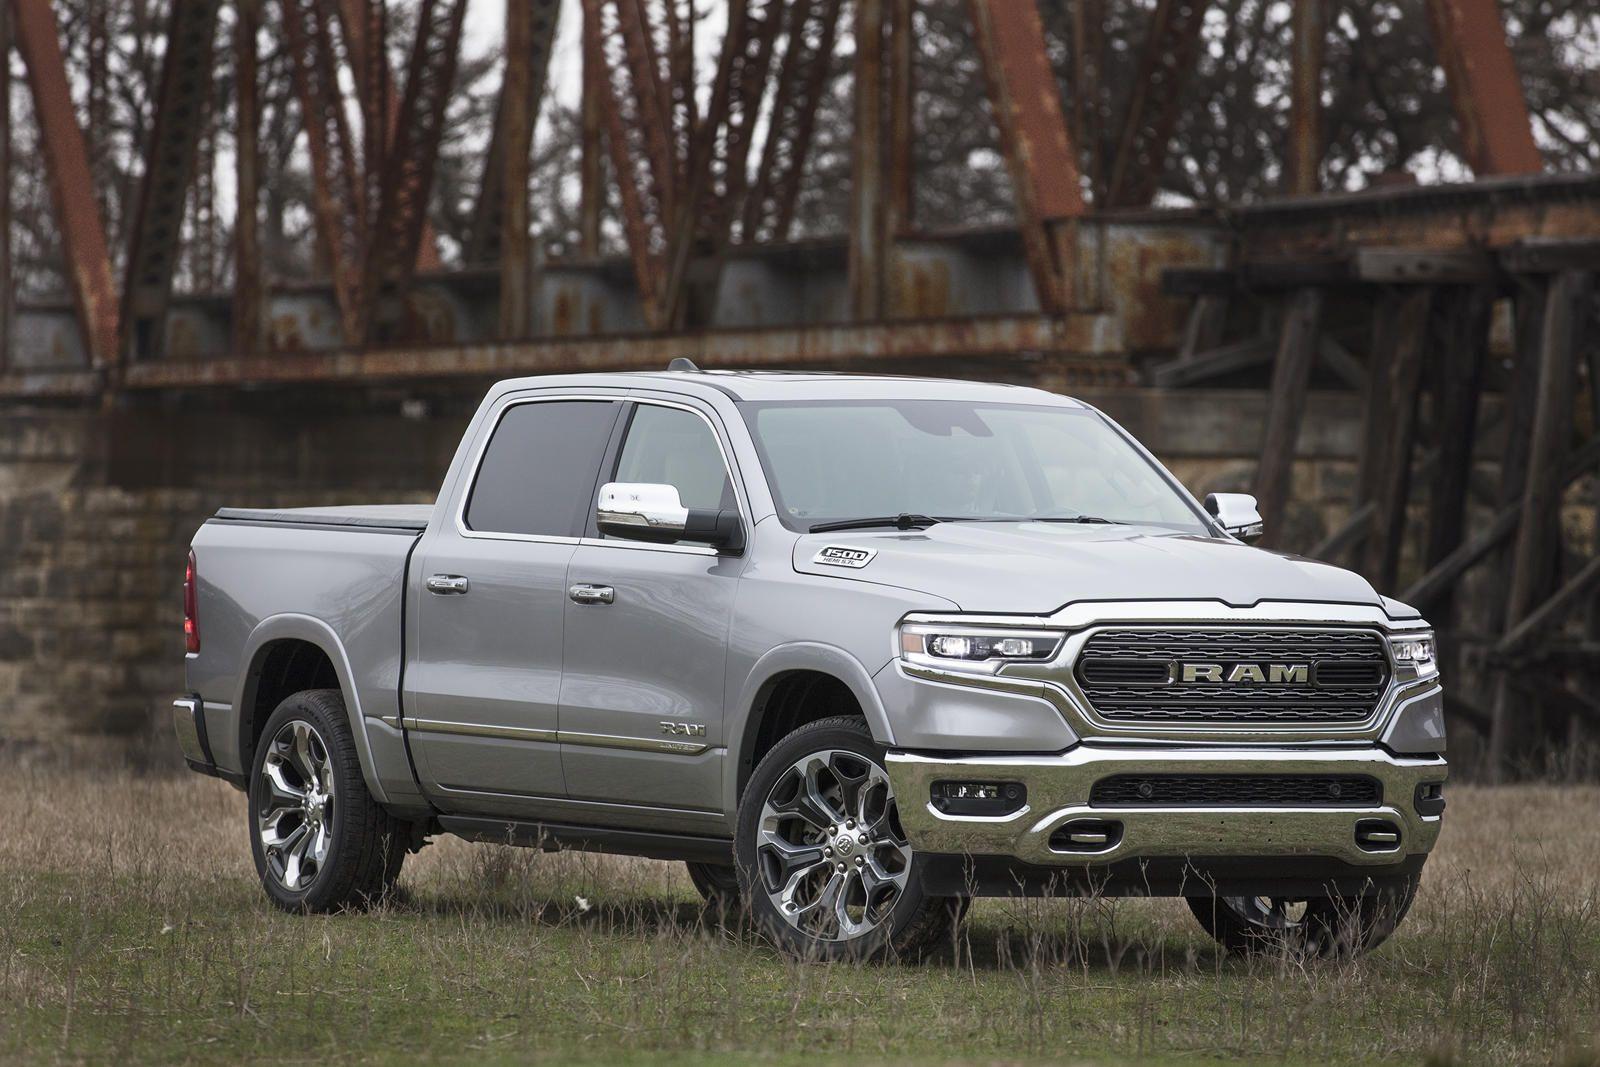 2020 Ram 1500 Test Drive Review Trucking Has A New Benchmark In 2020 Dodge Trucks Ram Dodge Hemi Dodge Pickup